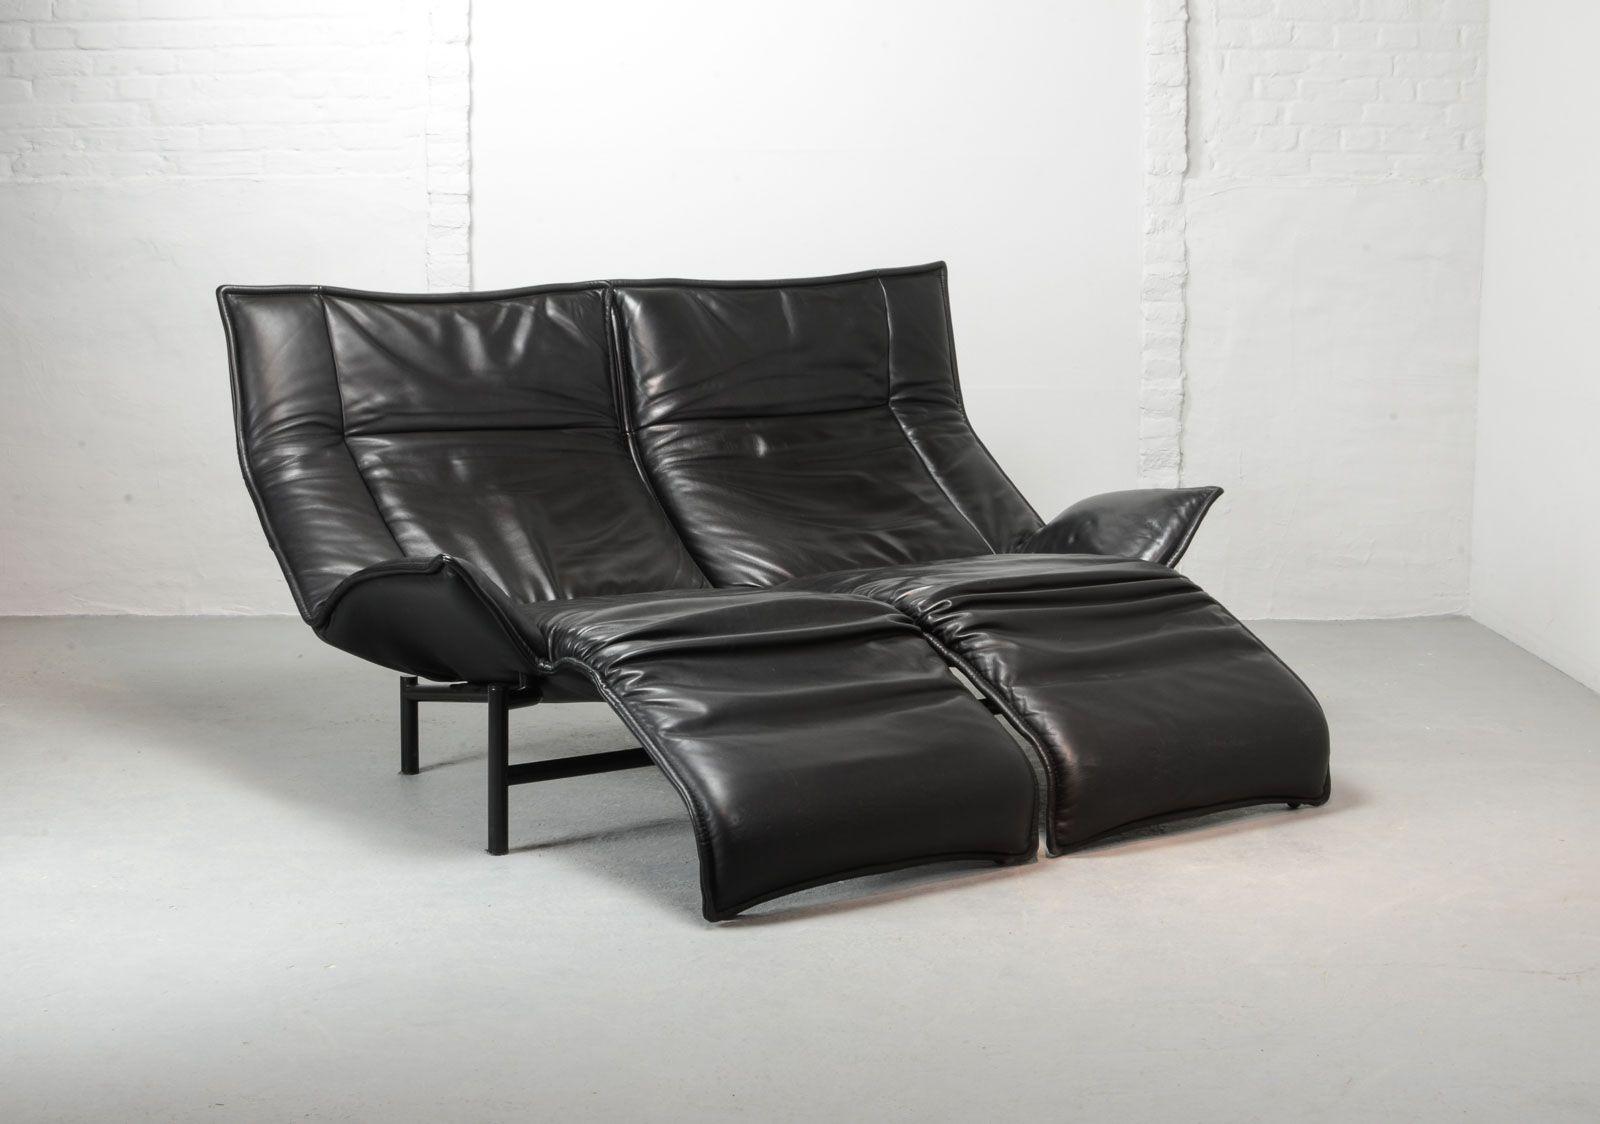 canape veranda fabulous canape design pour veranda alu noir nouveau belle canape design pour. Black Bedroom Furniture Sets. Home Design Ideas